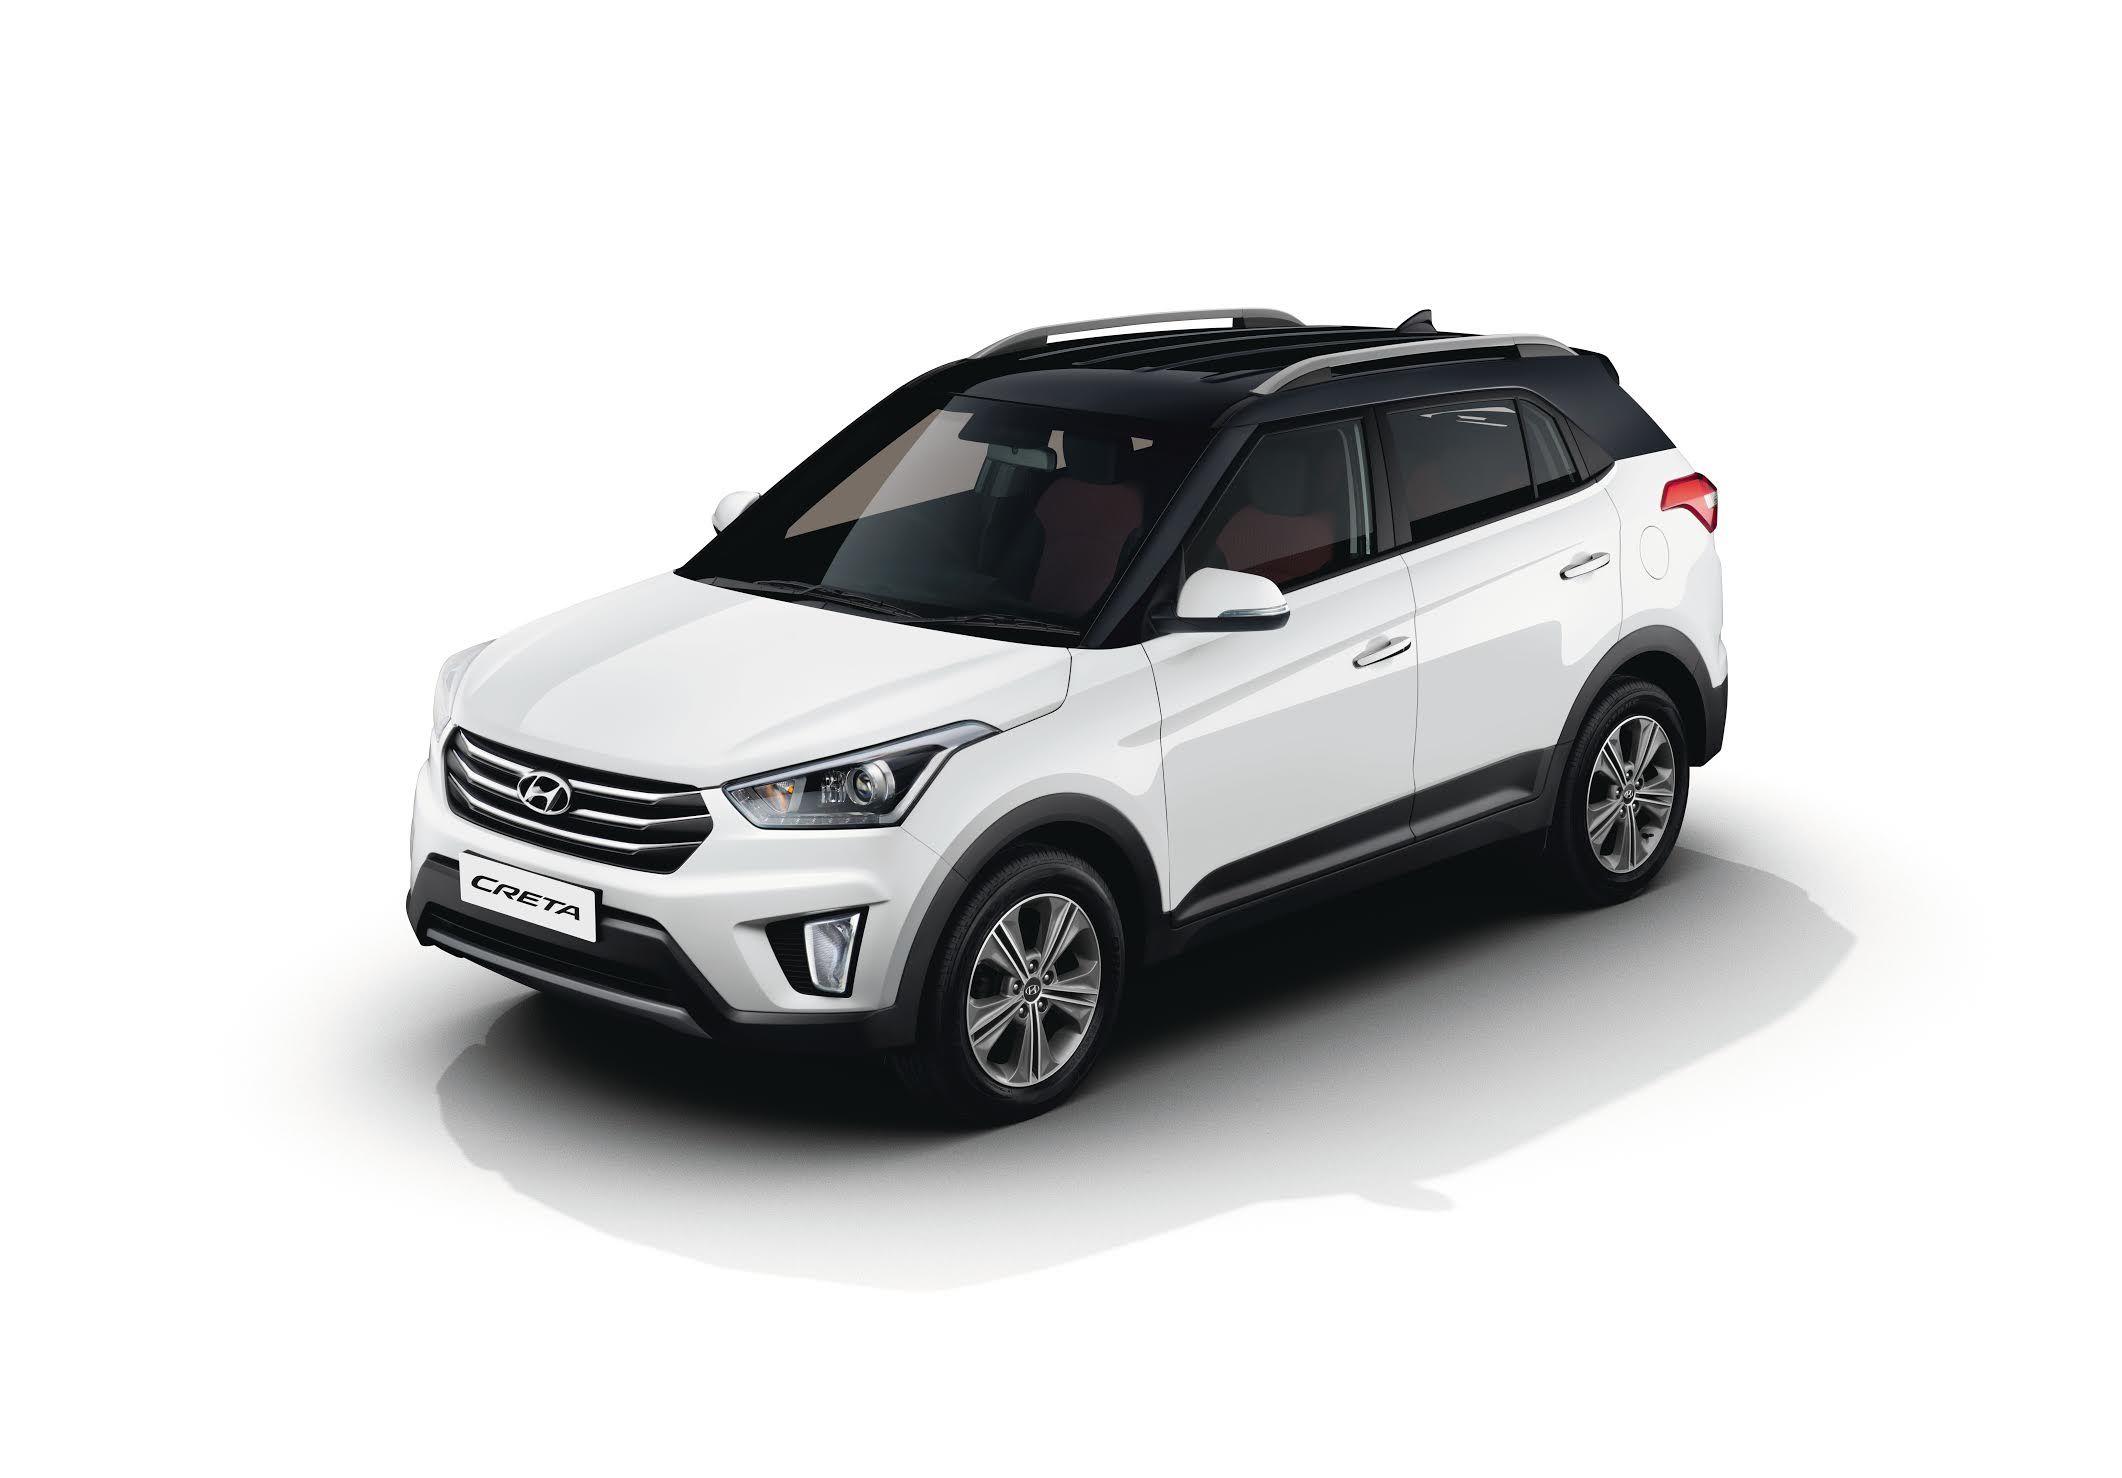 Hyundai Creta Price Variant Wise Compared Post Gst Hyundai Cars And Coffee Car